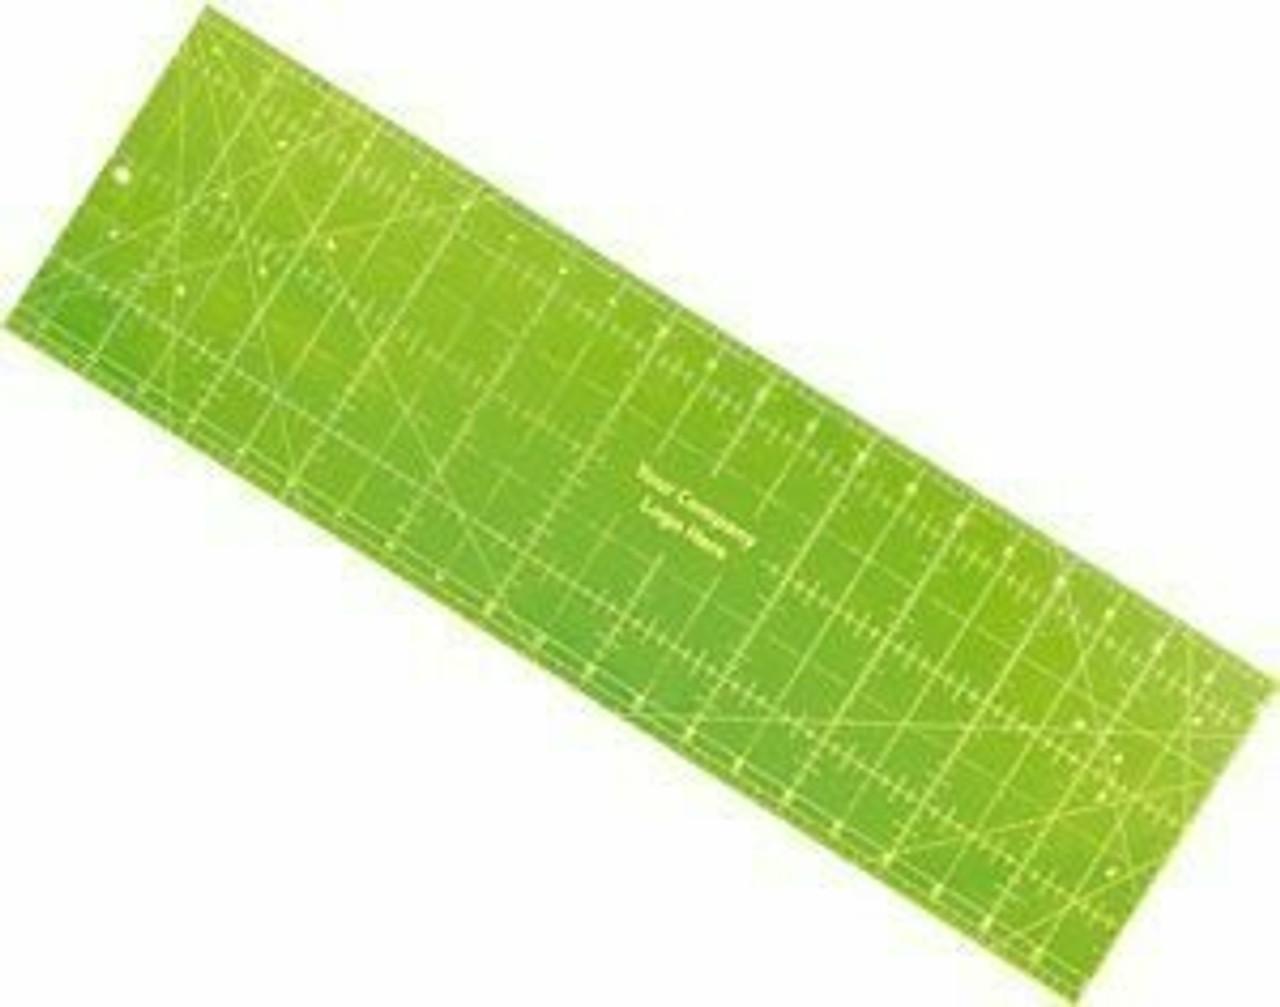 24inch x 6.5inch ruler